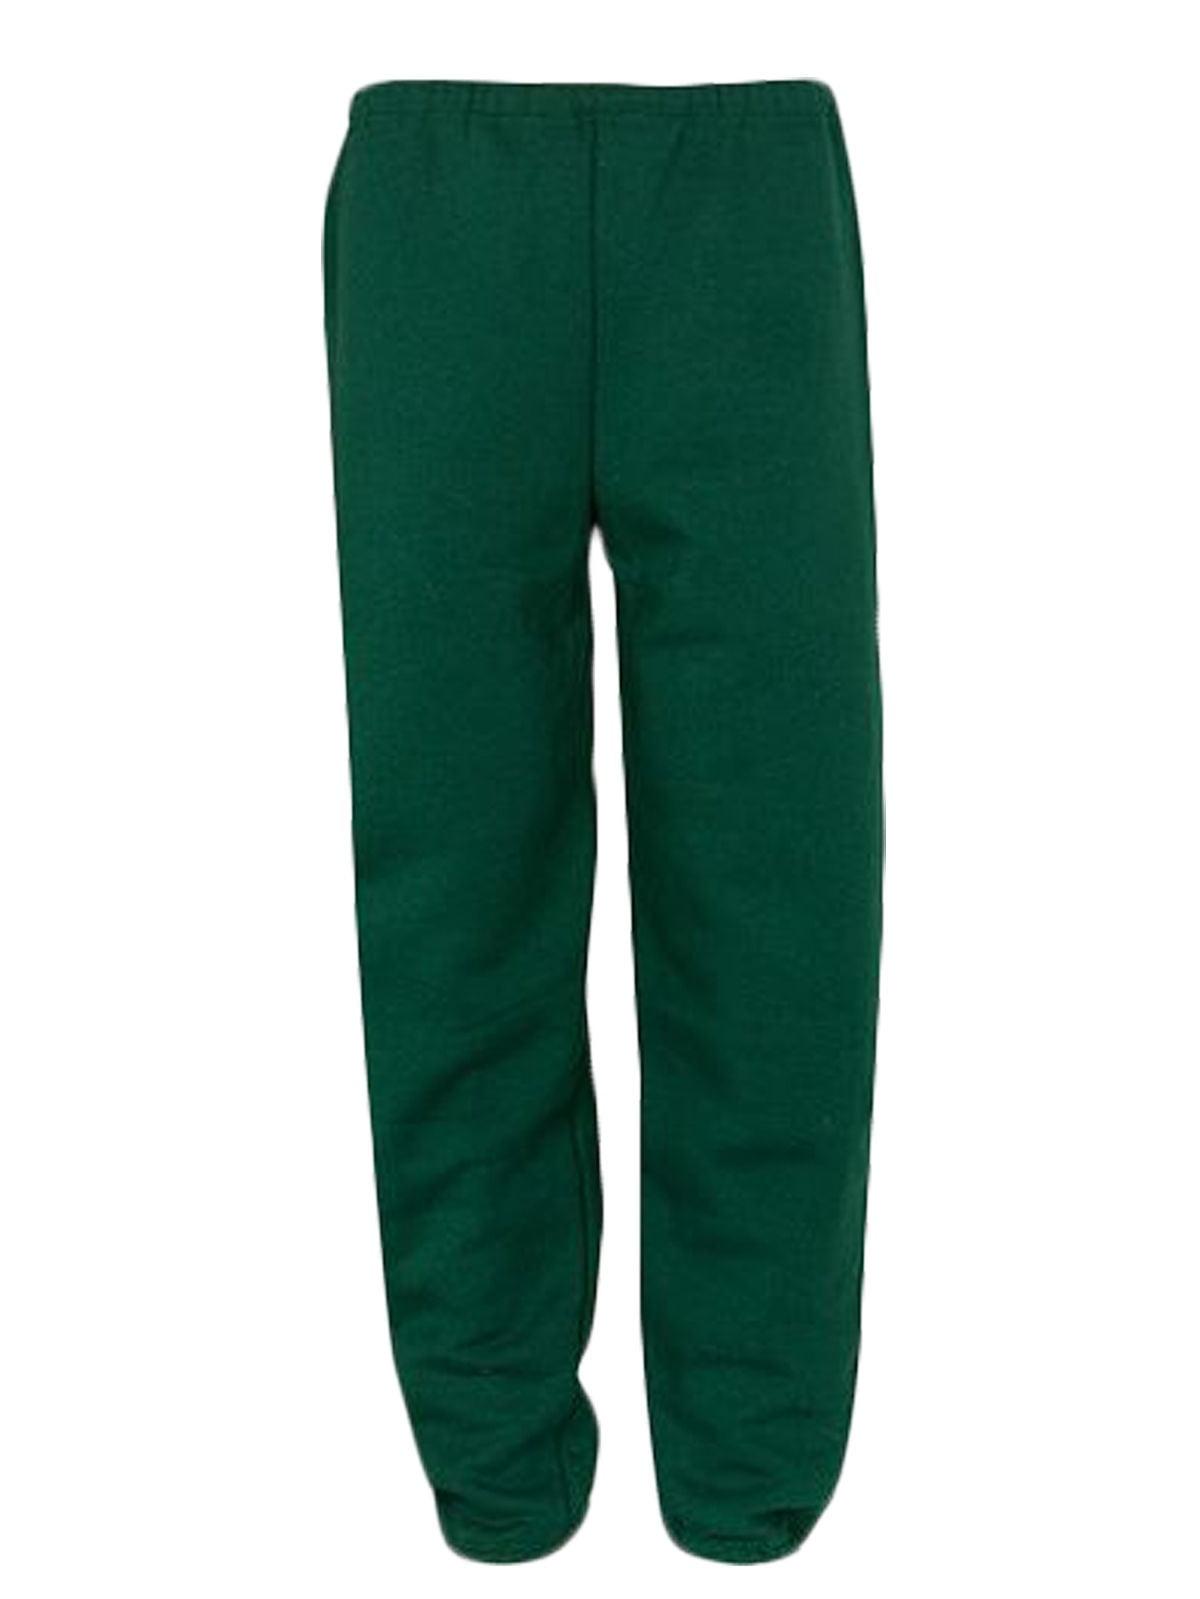 Russell Athletic Men's Big Tall Sweatpants Jogging 2 Pocket Pants Sweats